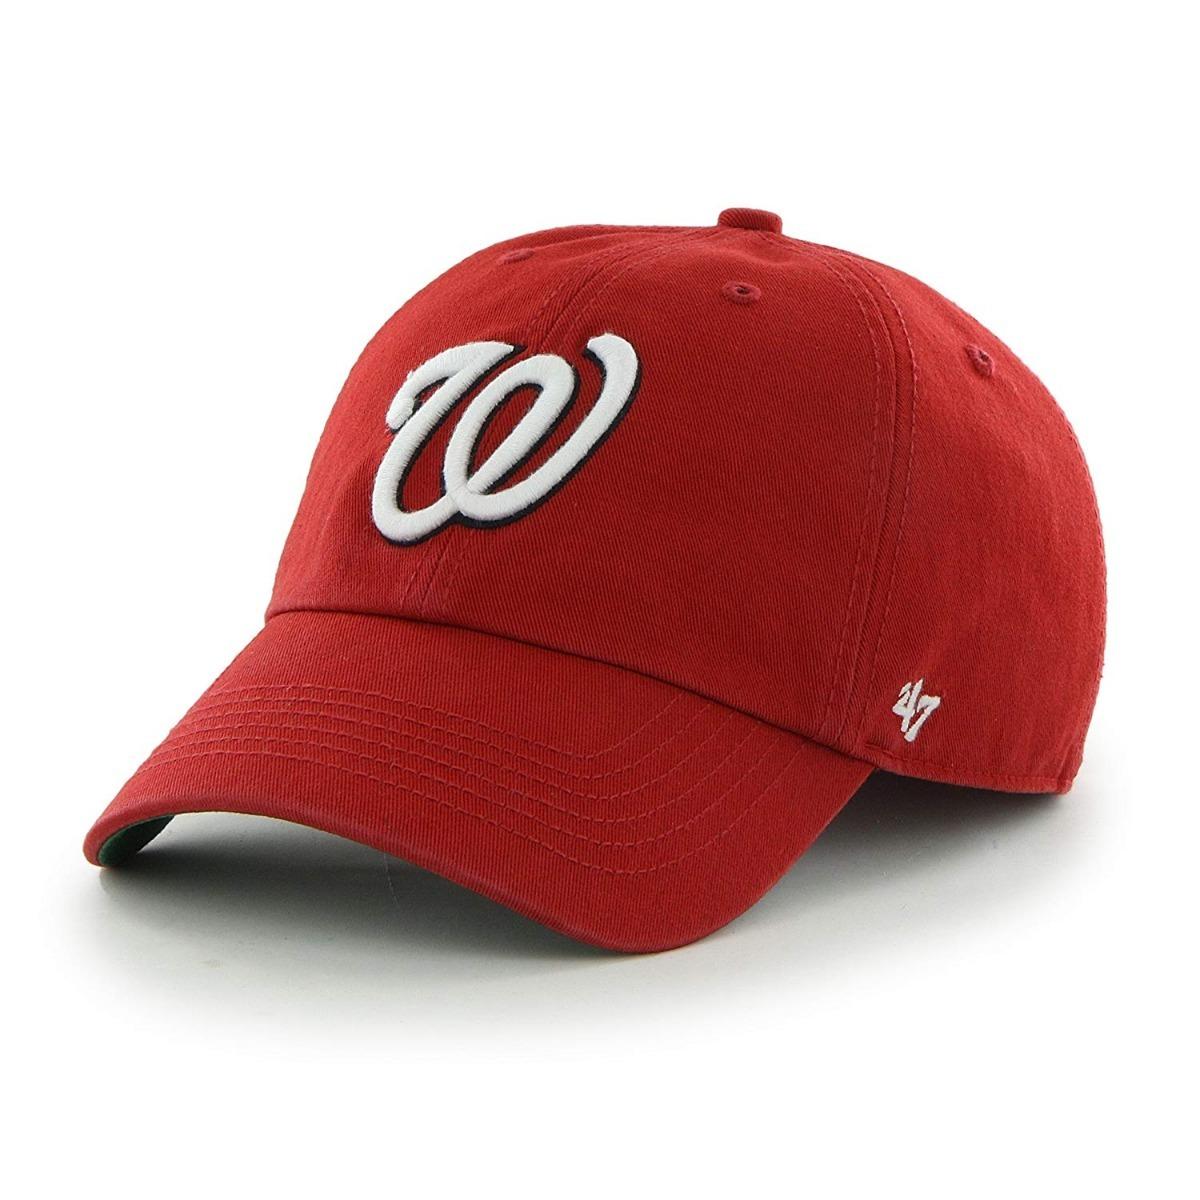 47 Franchise Fitted Washington Nationals Gorra Mlb M -   549.00 en ... 0722e31413f